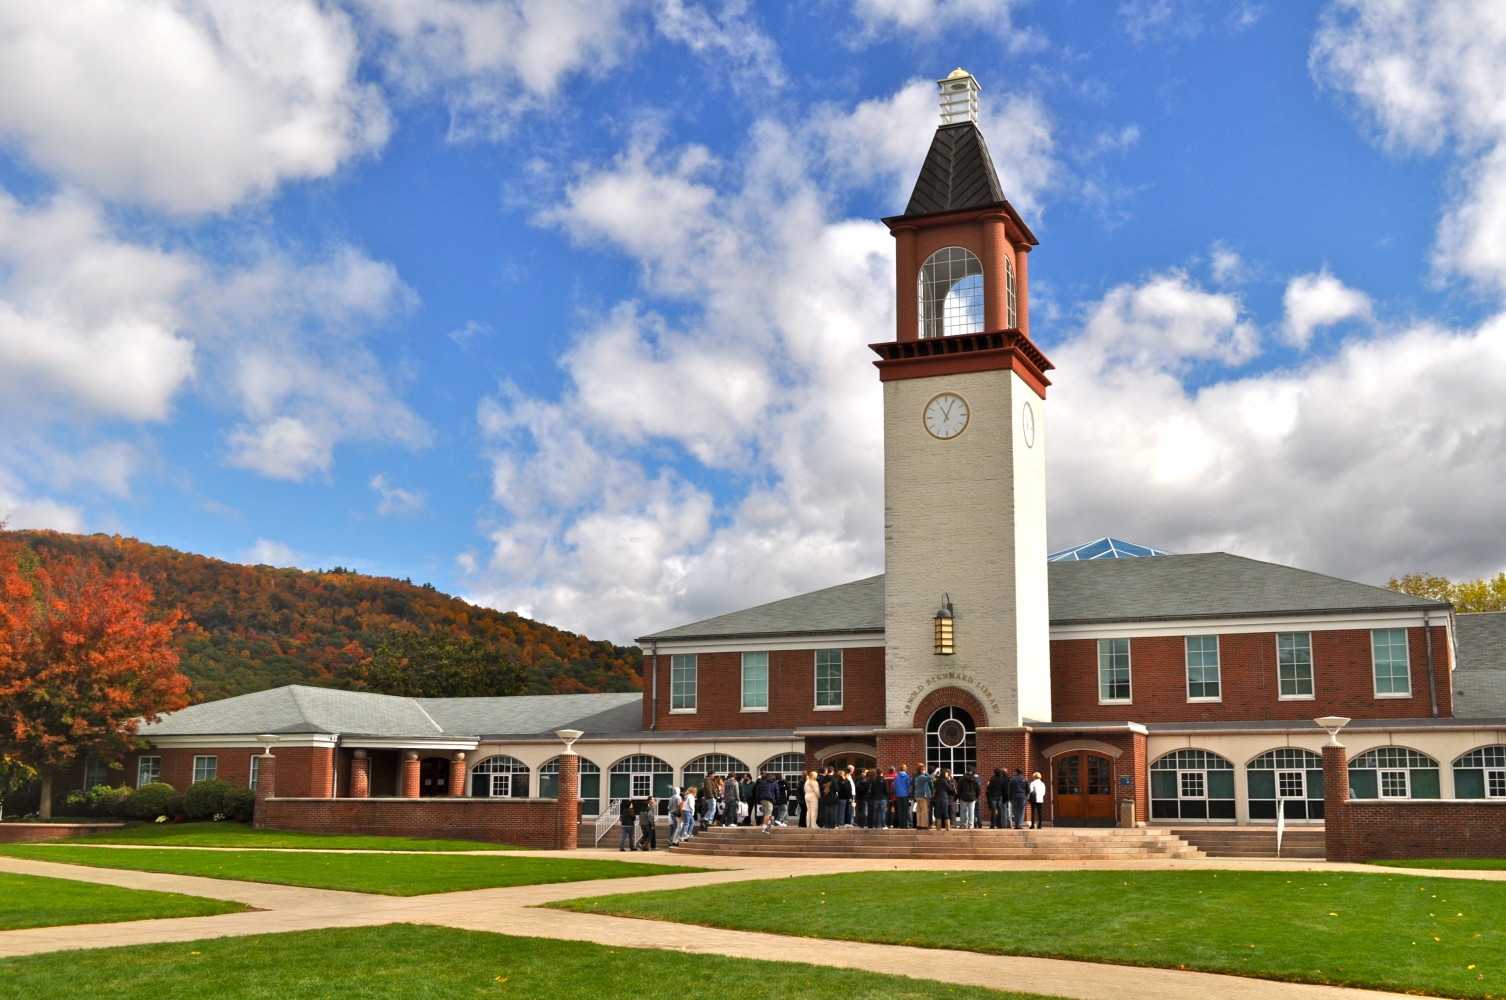 Restaurants and Cafes at Quinnipiac University